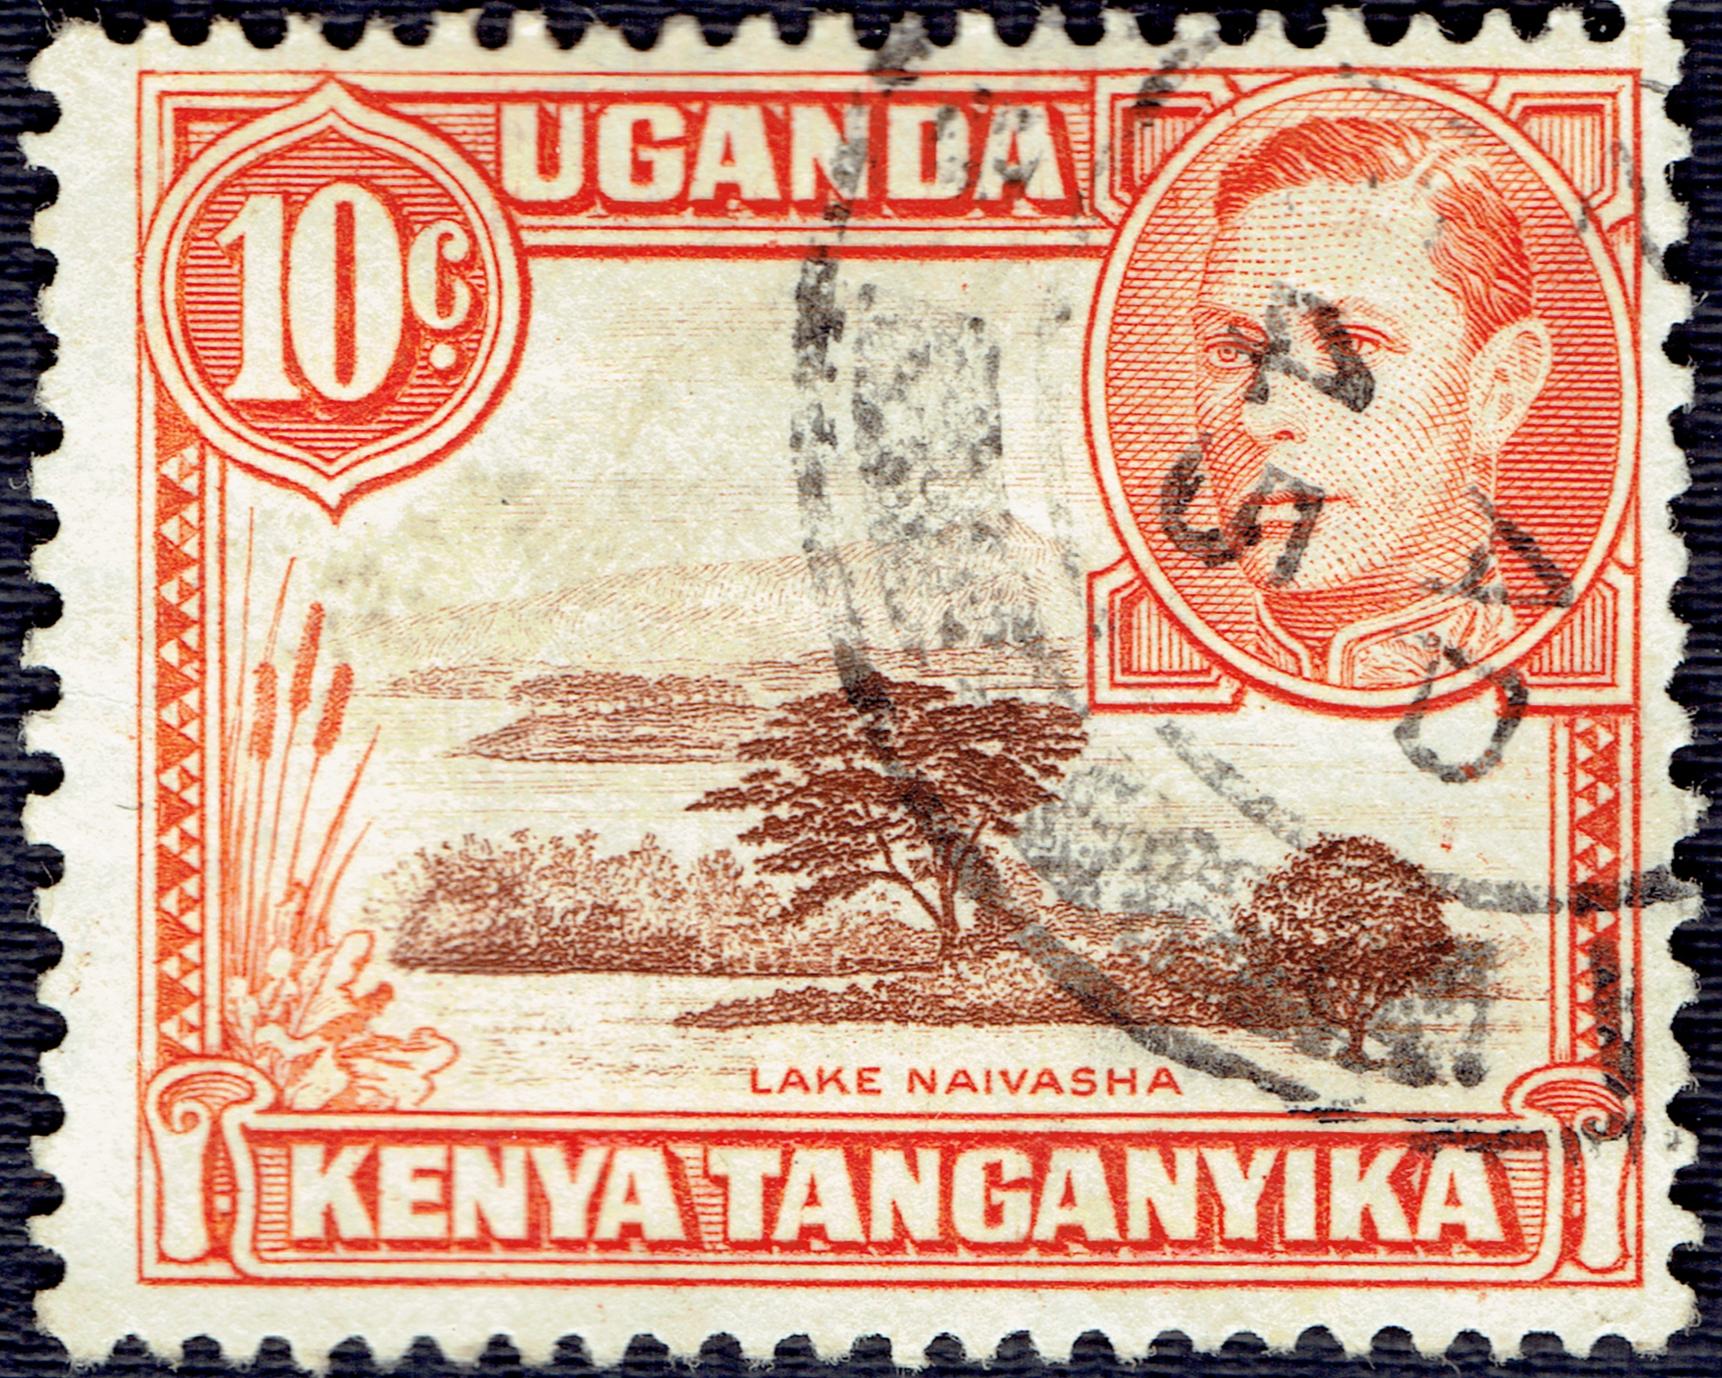 Kenya, Uganda & Tanganyika - Scott #69 (1938)